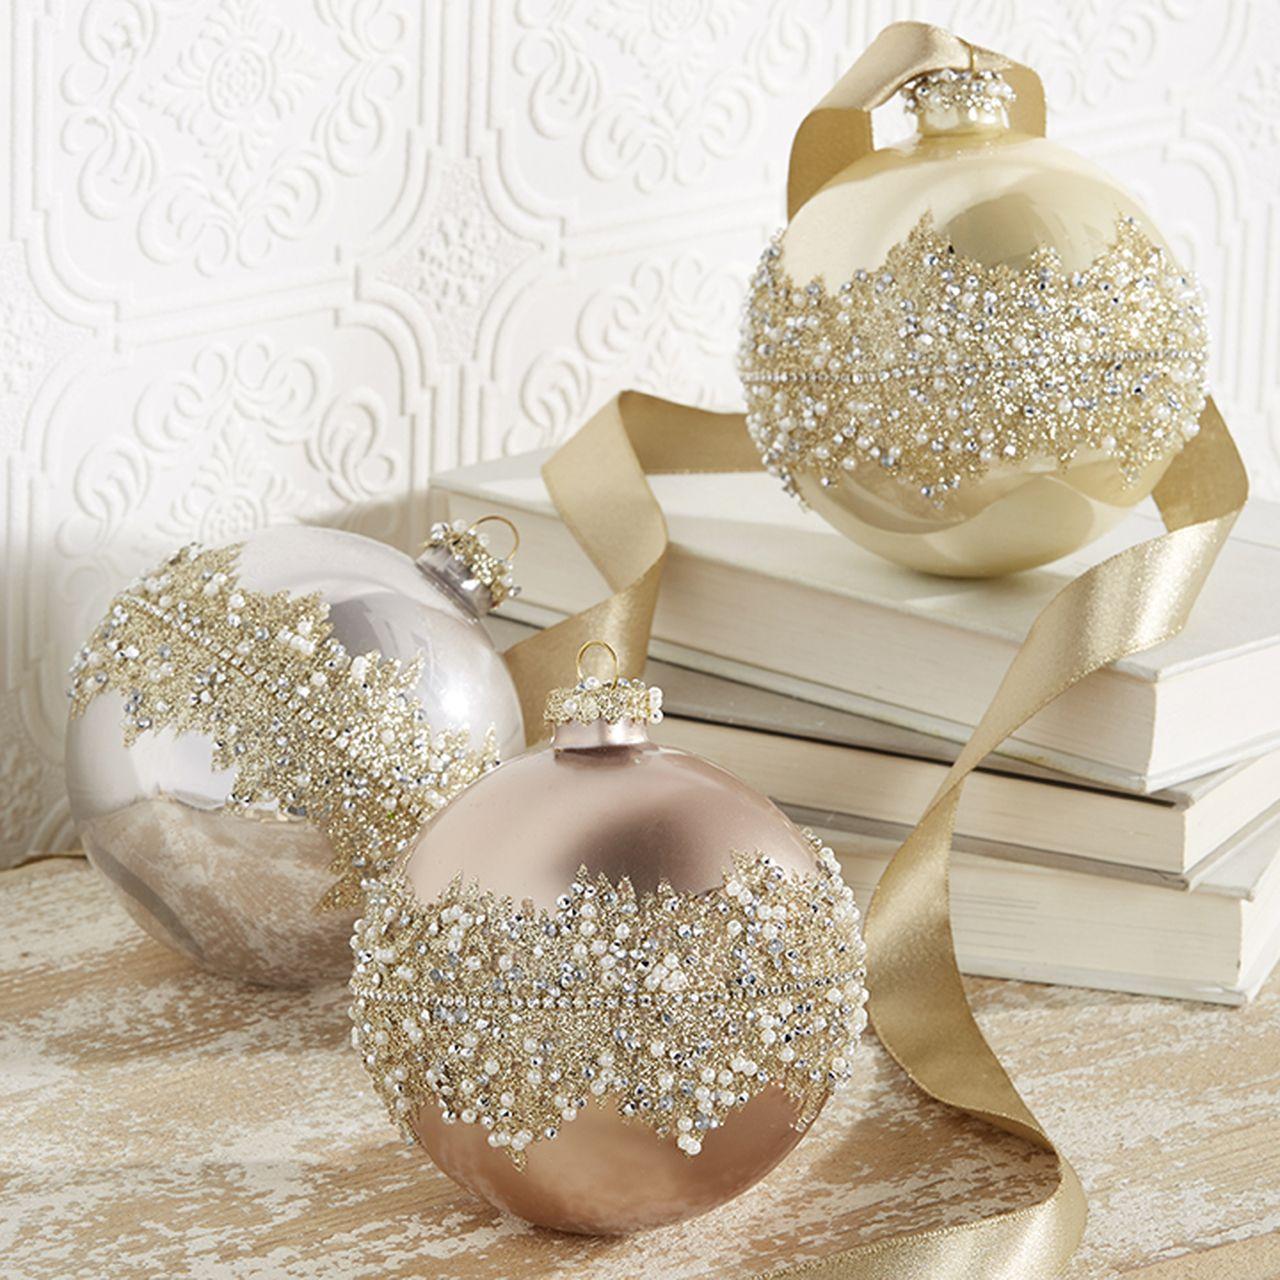 Raz 4 Gold Silver Or Rose Beaded Glass Ball Christmas Ornament Raz Imports Raz Glass Christmas Ornaments Christmas Ornaments Beaded Christmas Ornaments